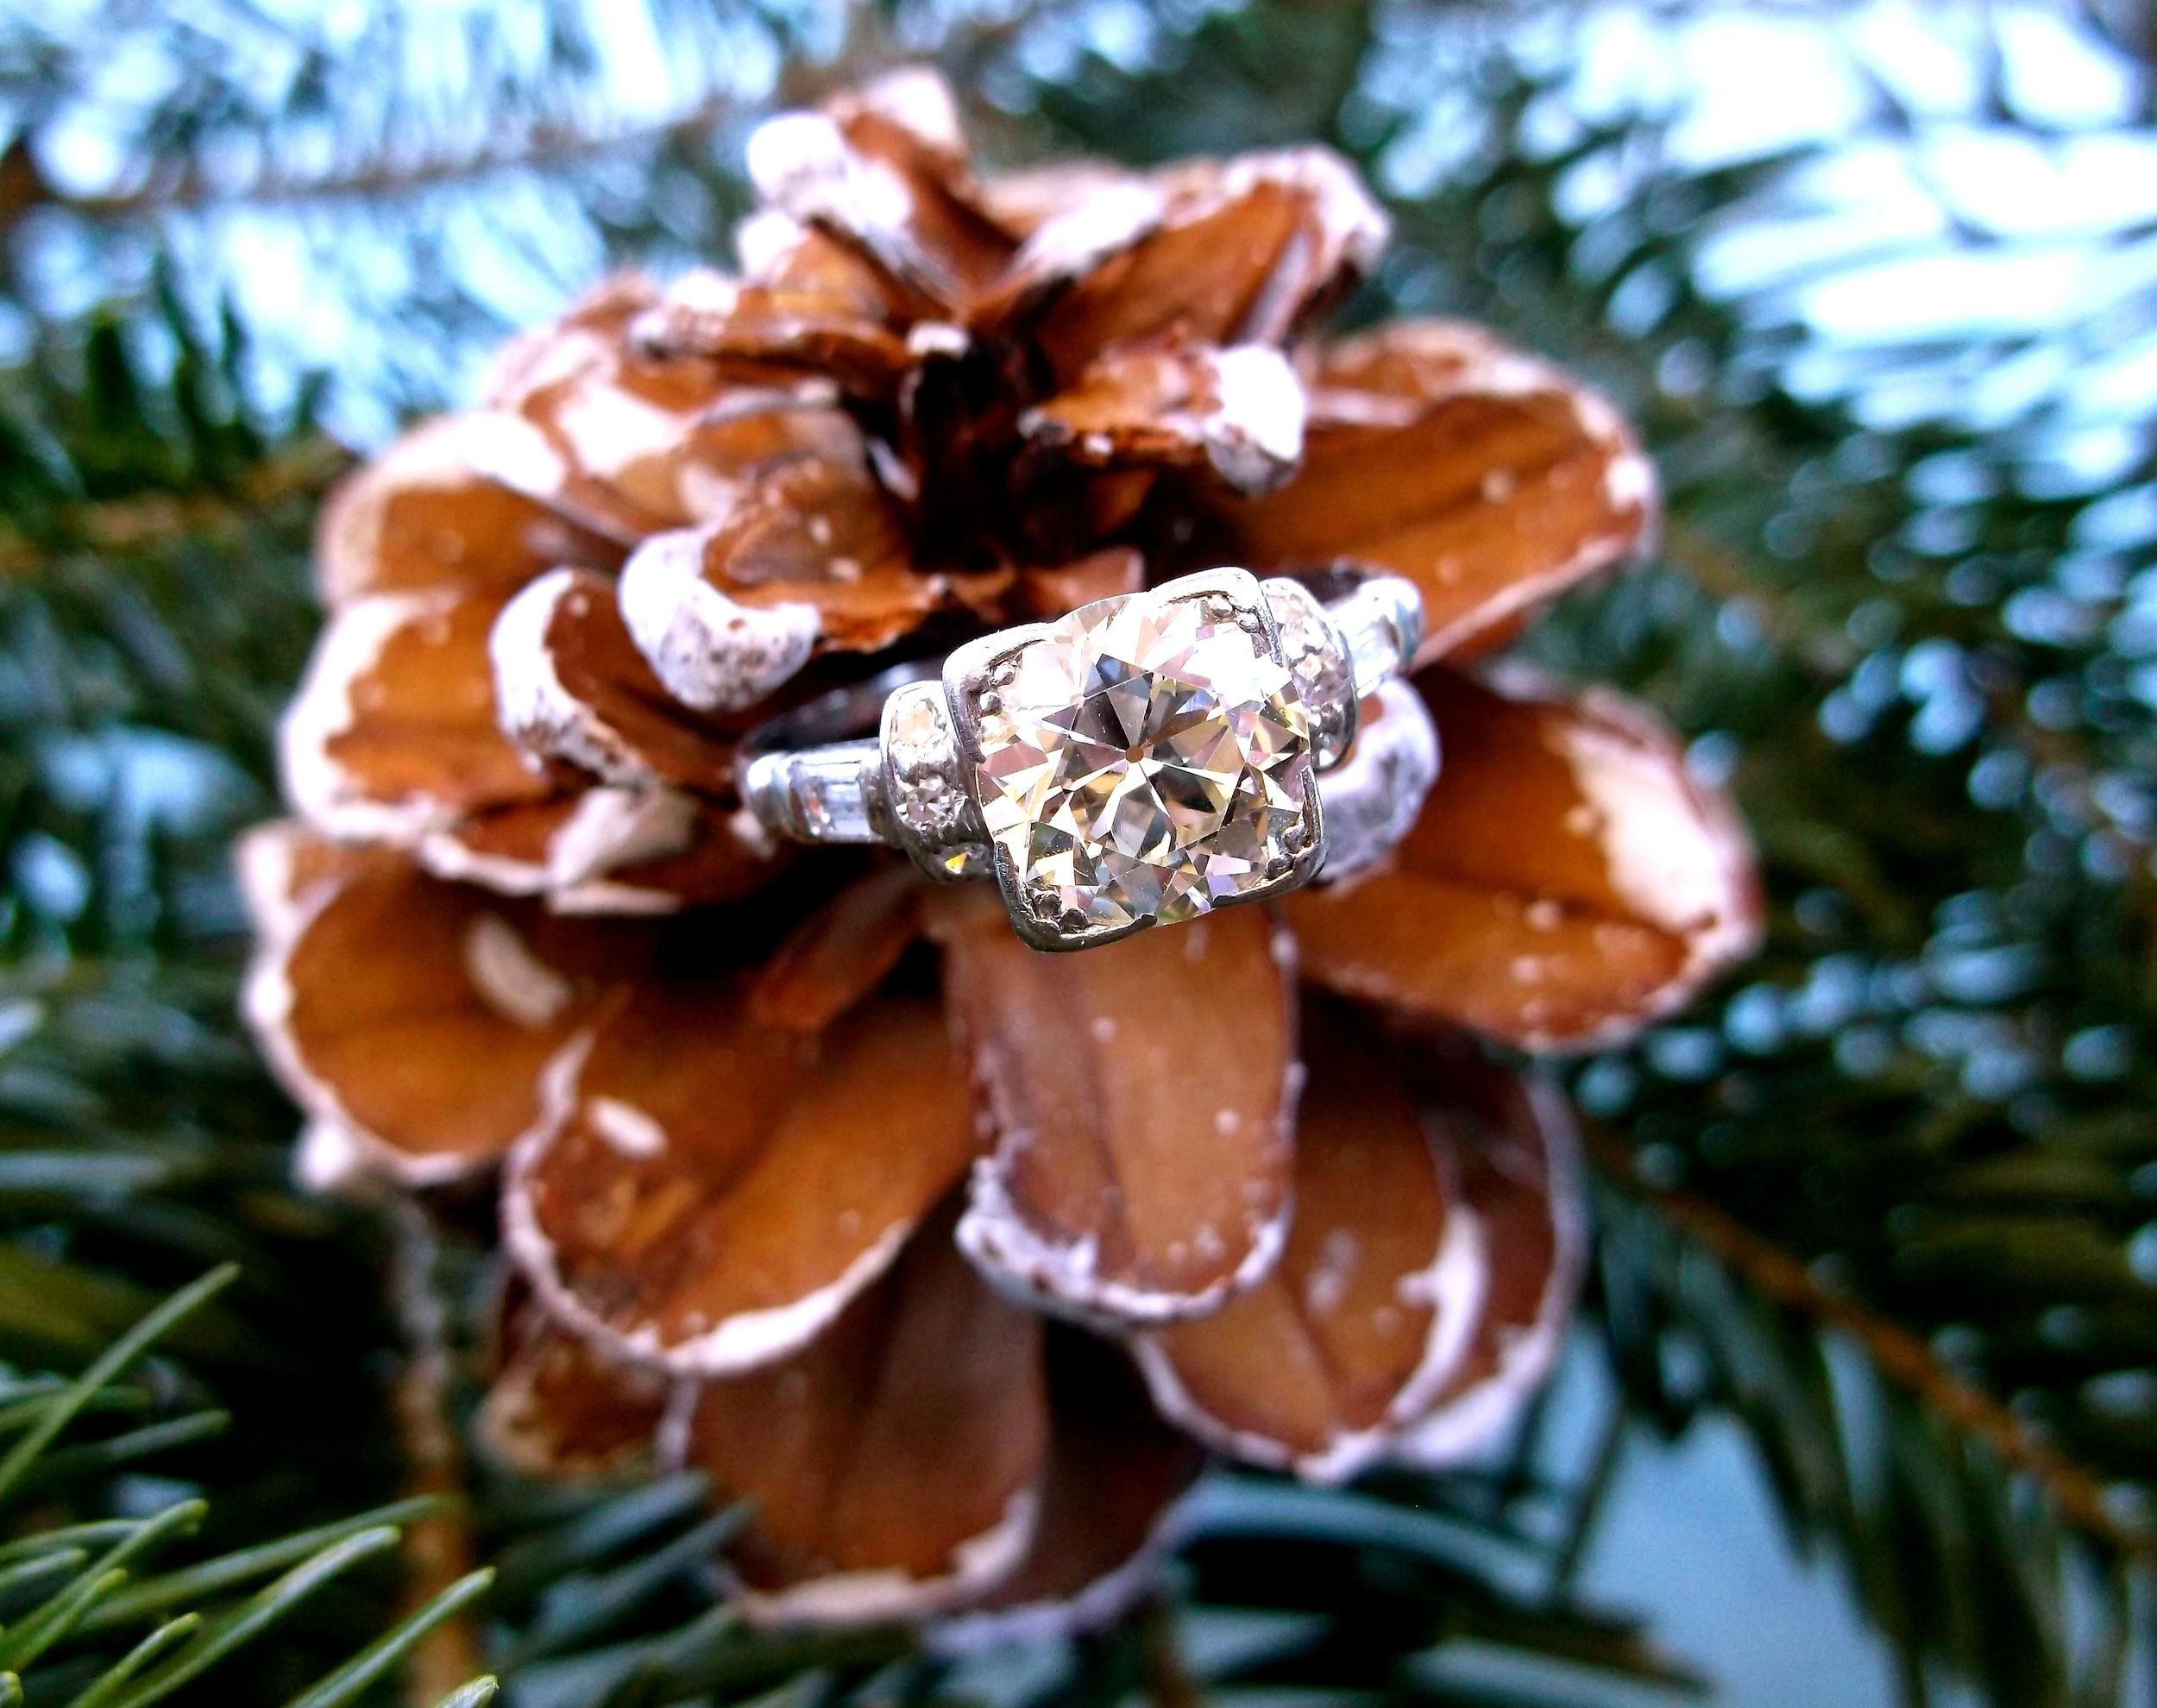 SOLD - Stunning Art Deco 1.85 carat Old European cut diamond set in a diamond and platinum mounting.